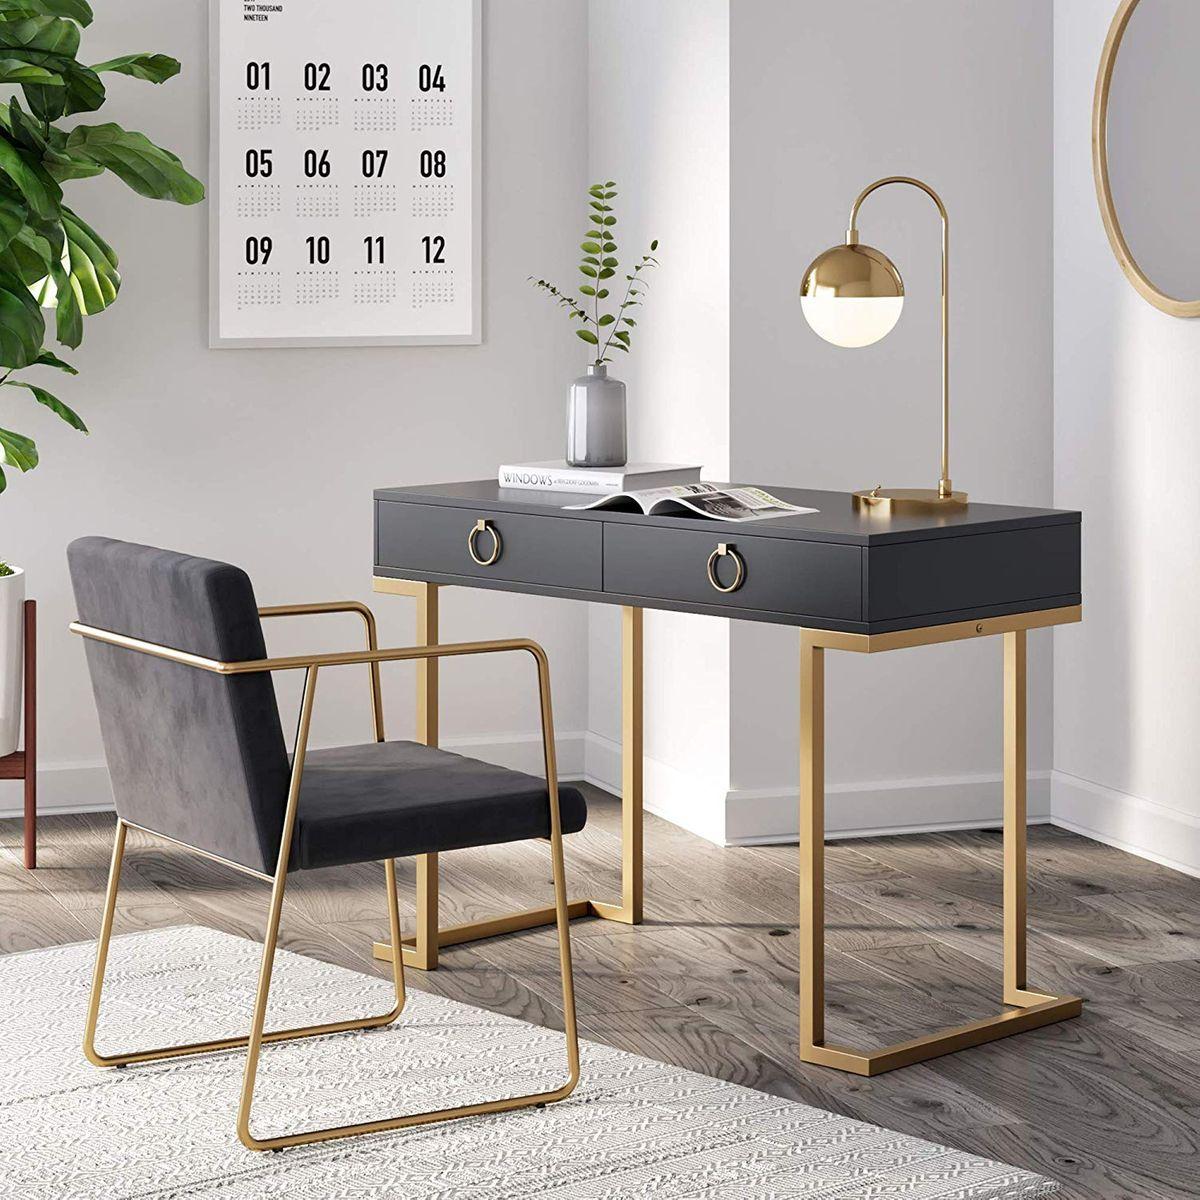 25 Cheap Desks 2021 The Strategist New York Magazine